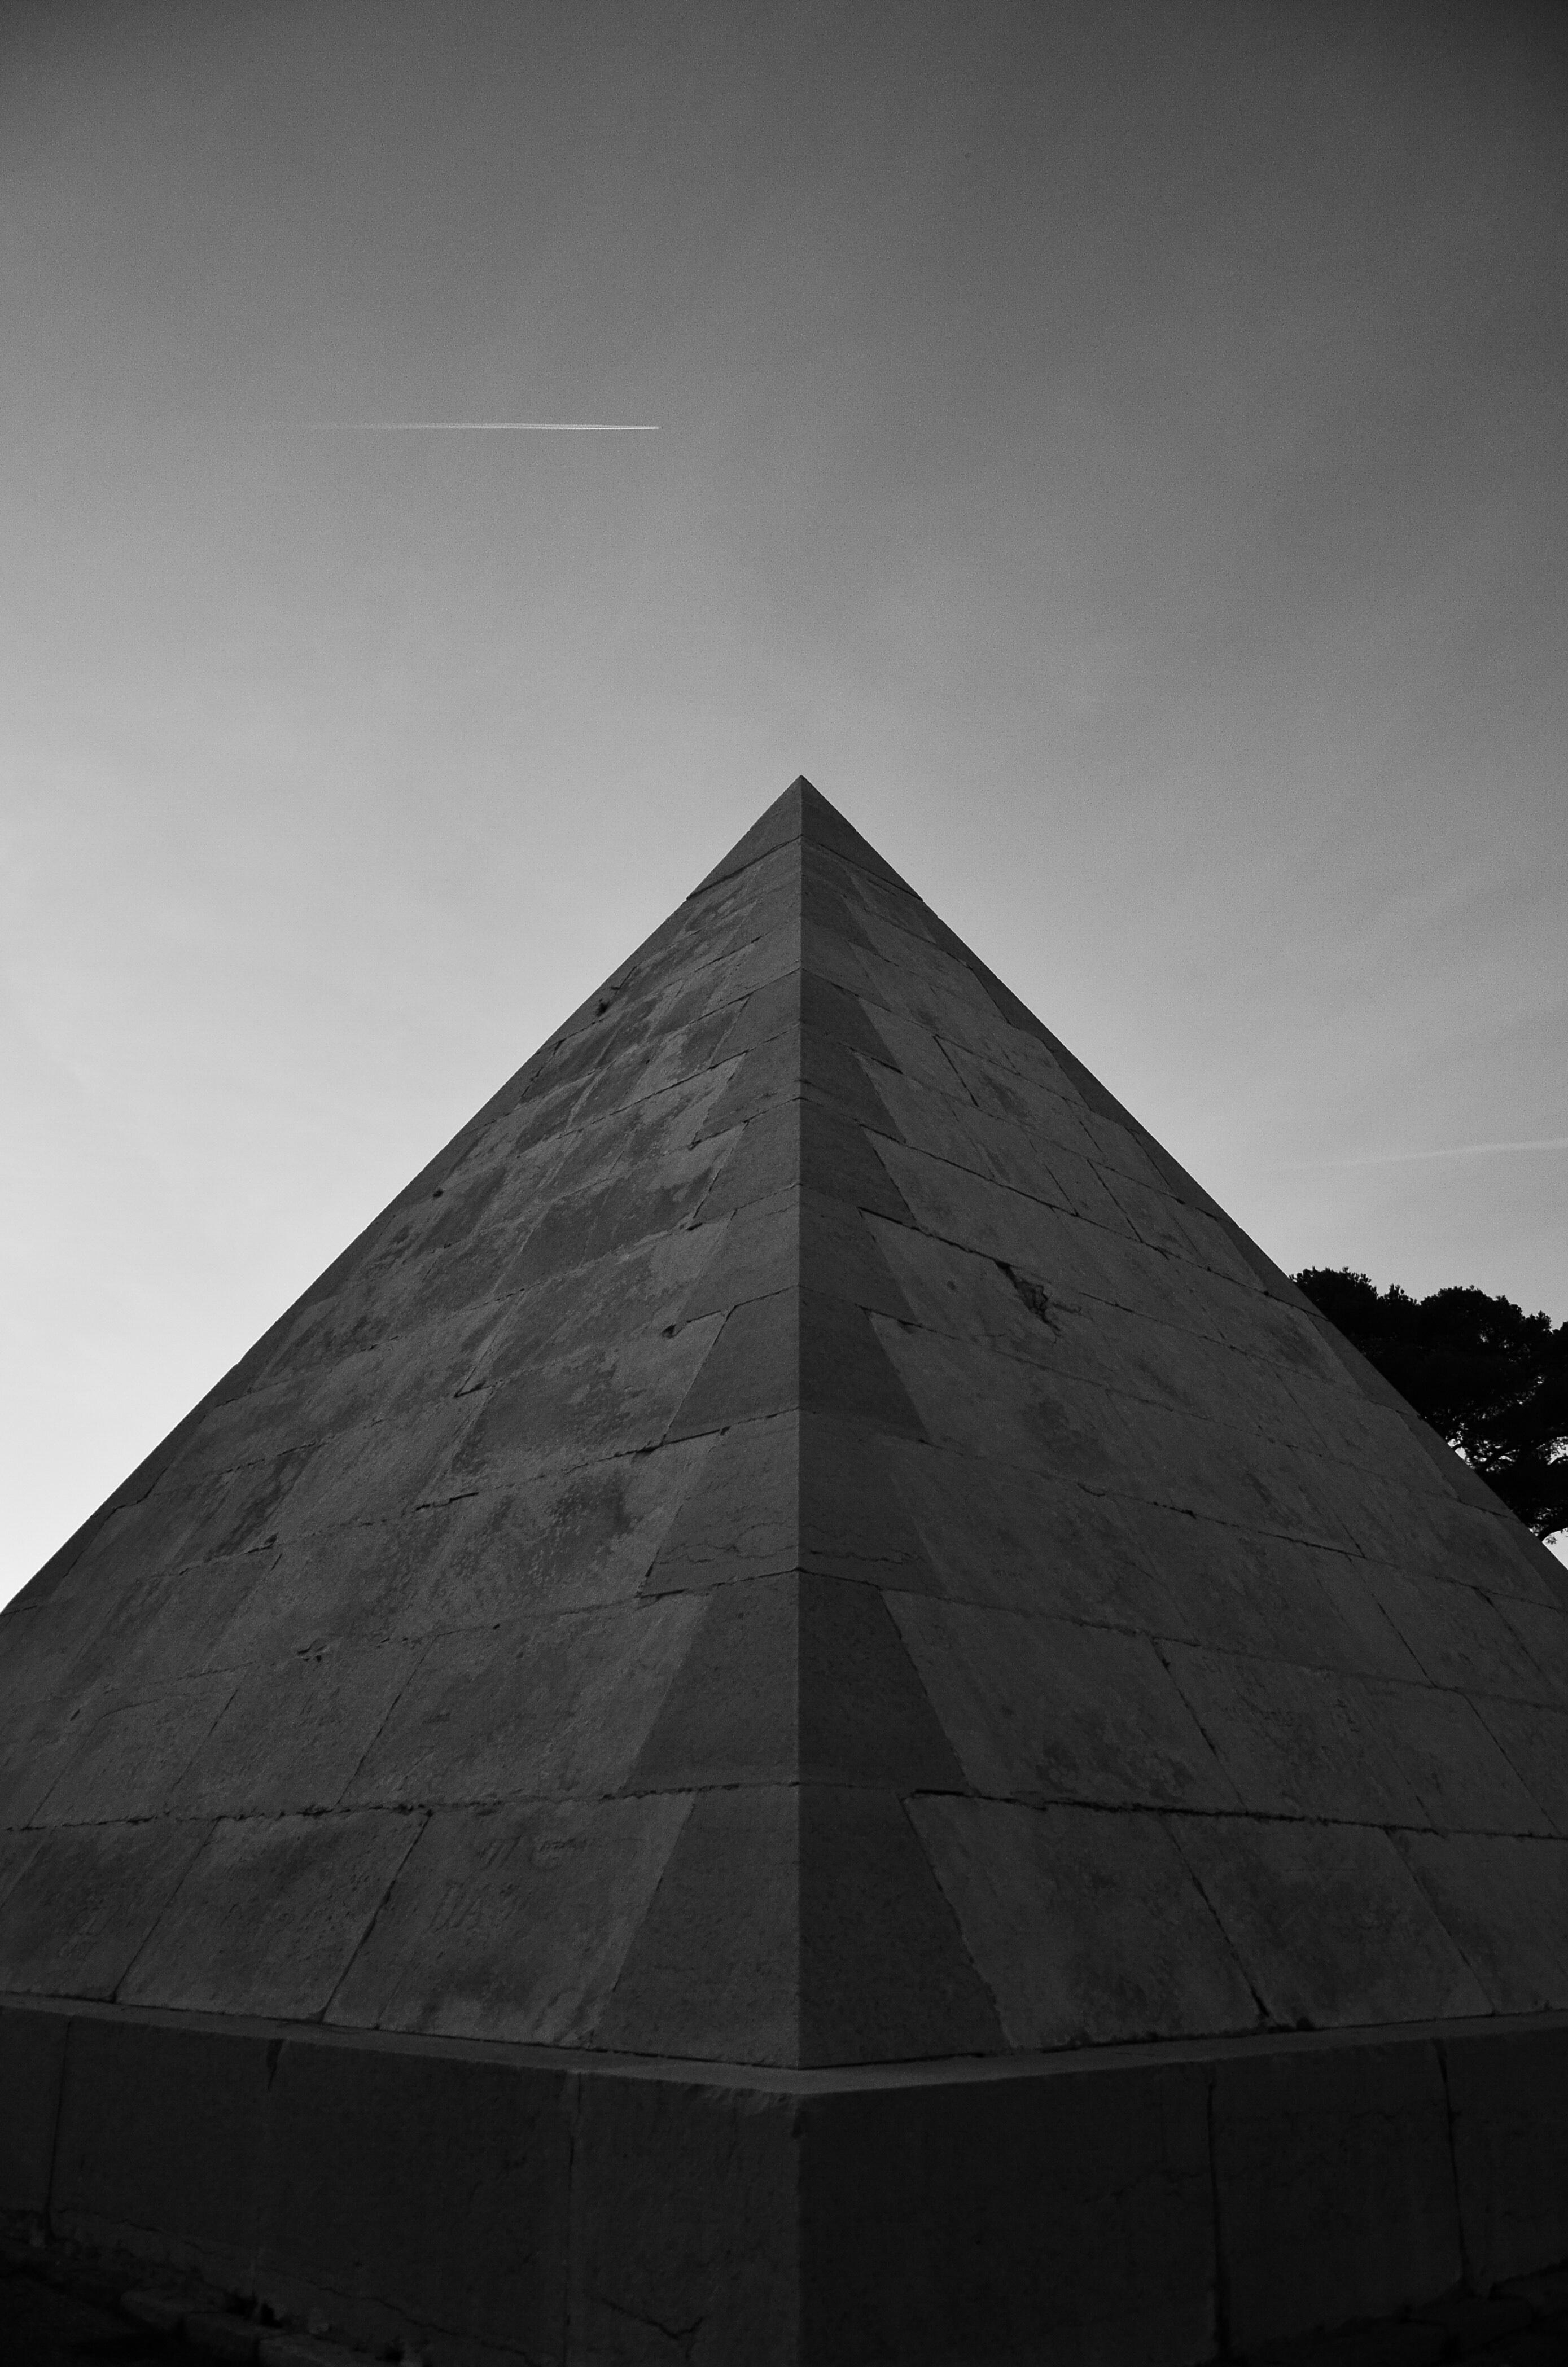 картинка черная пирамида на телефон долгу